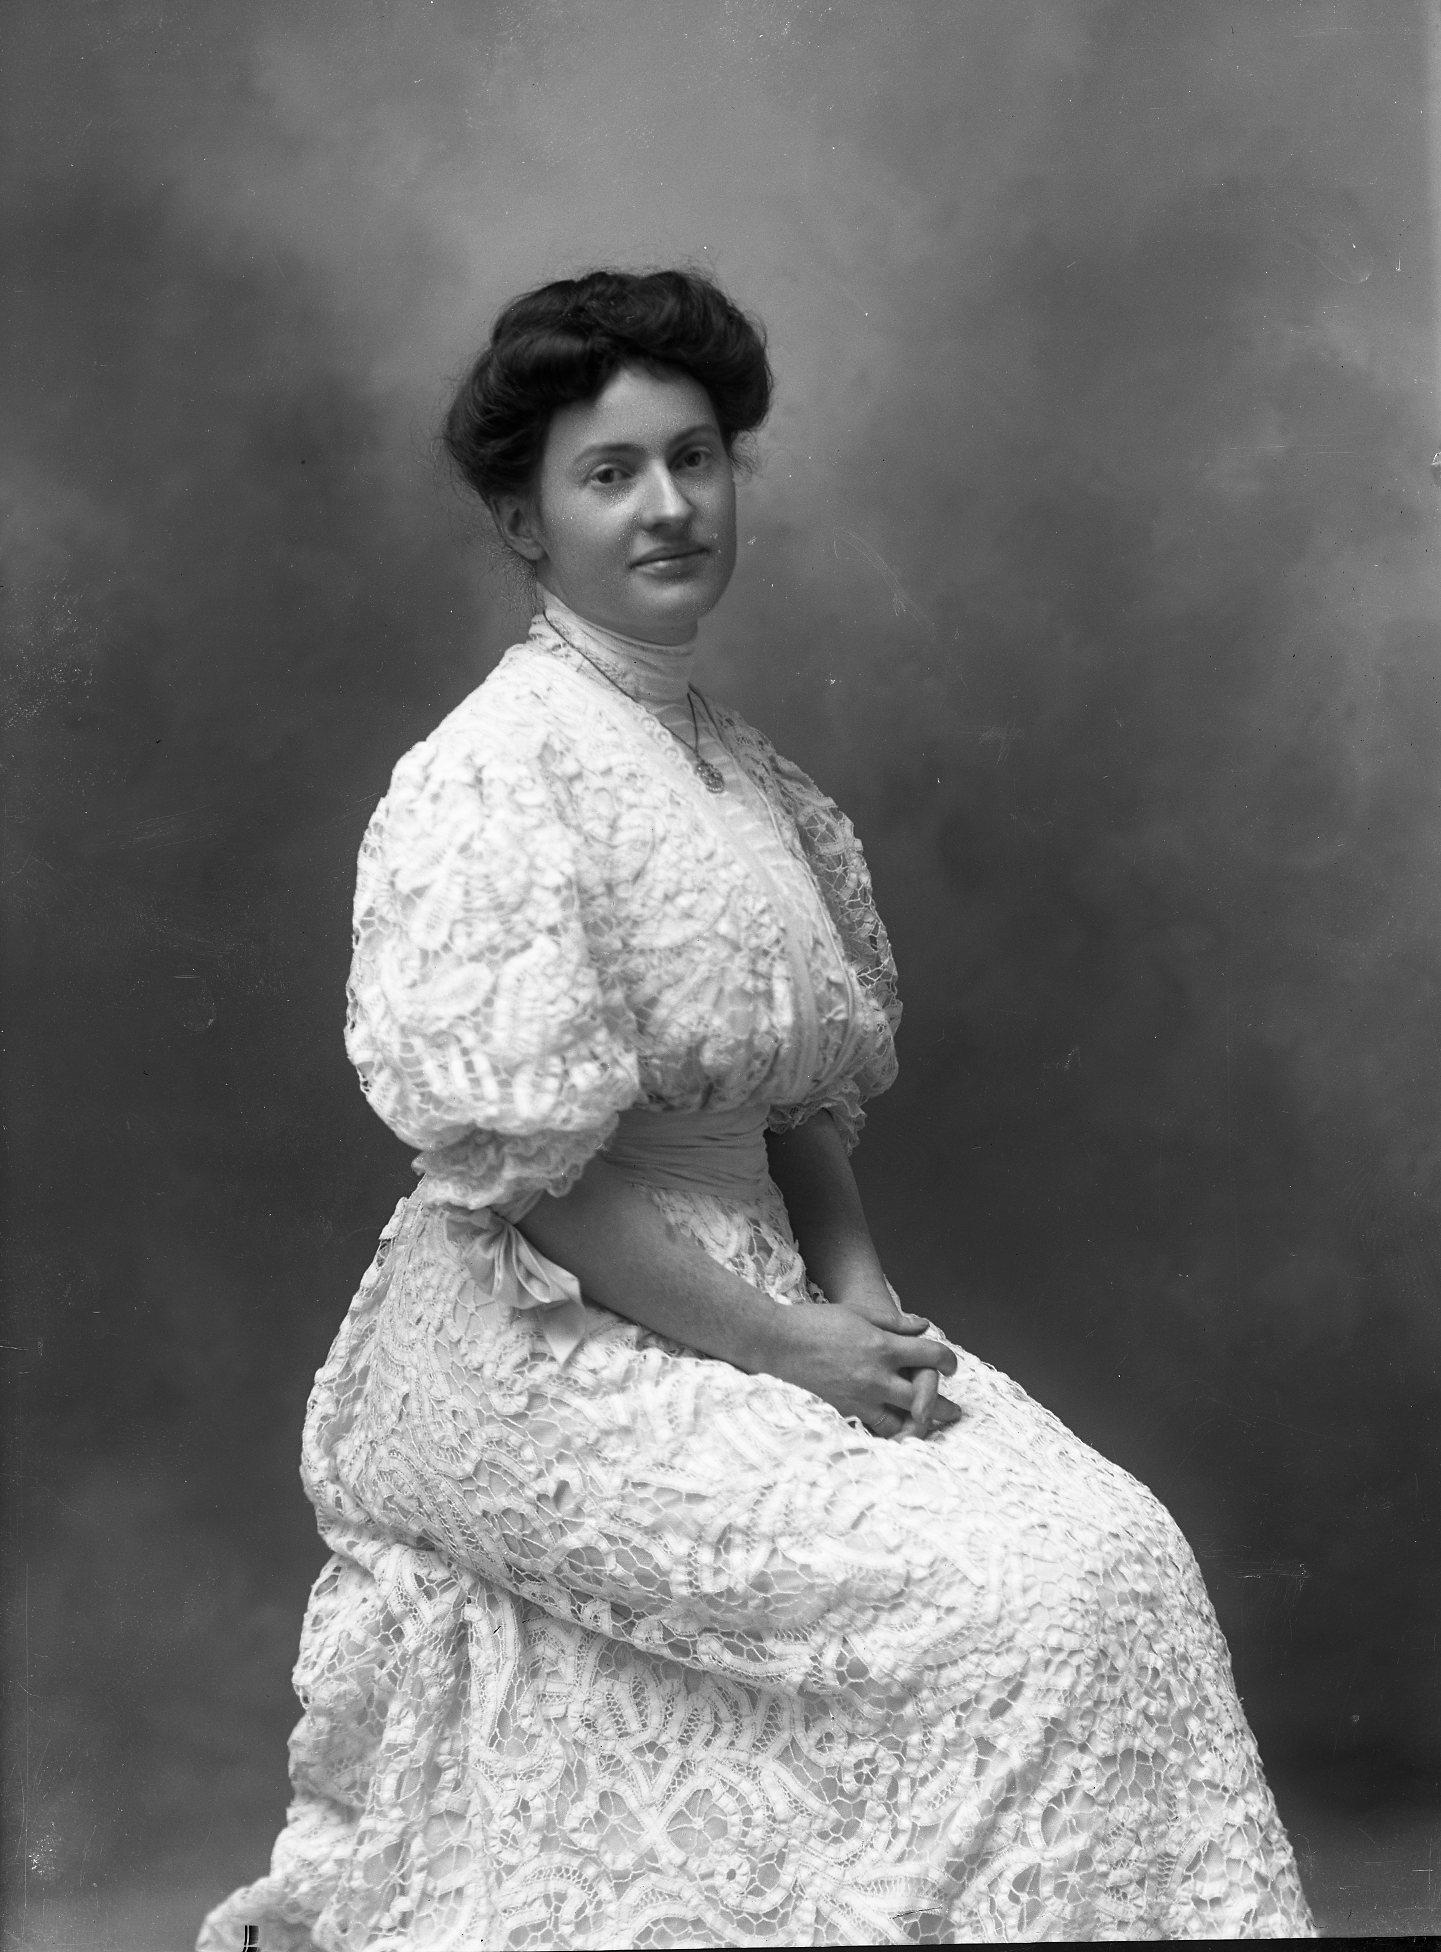 Mrs. MJ Flohr